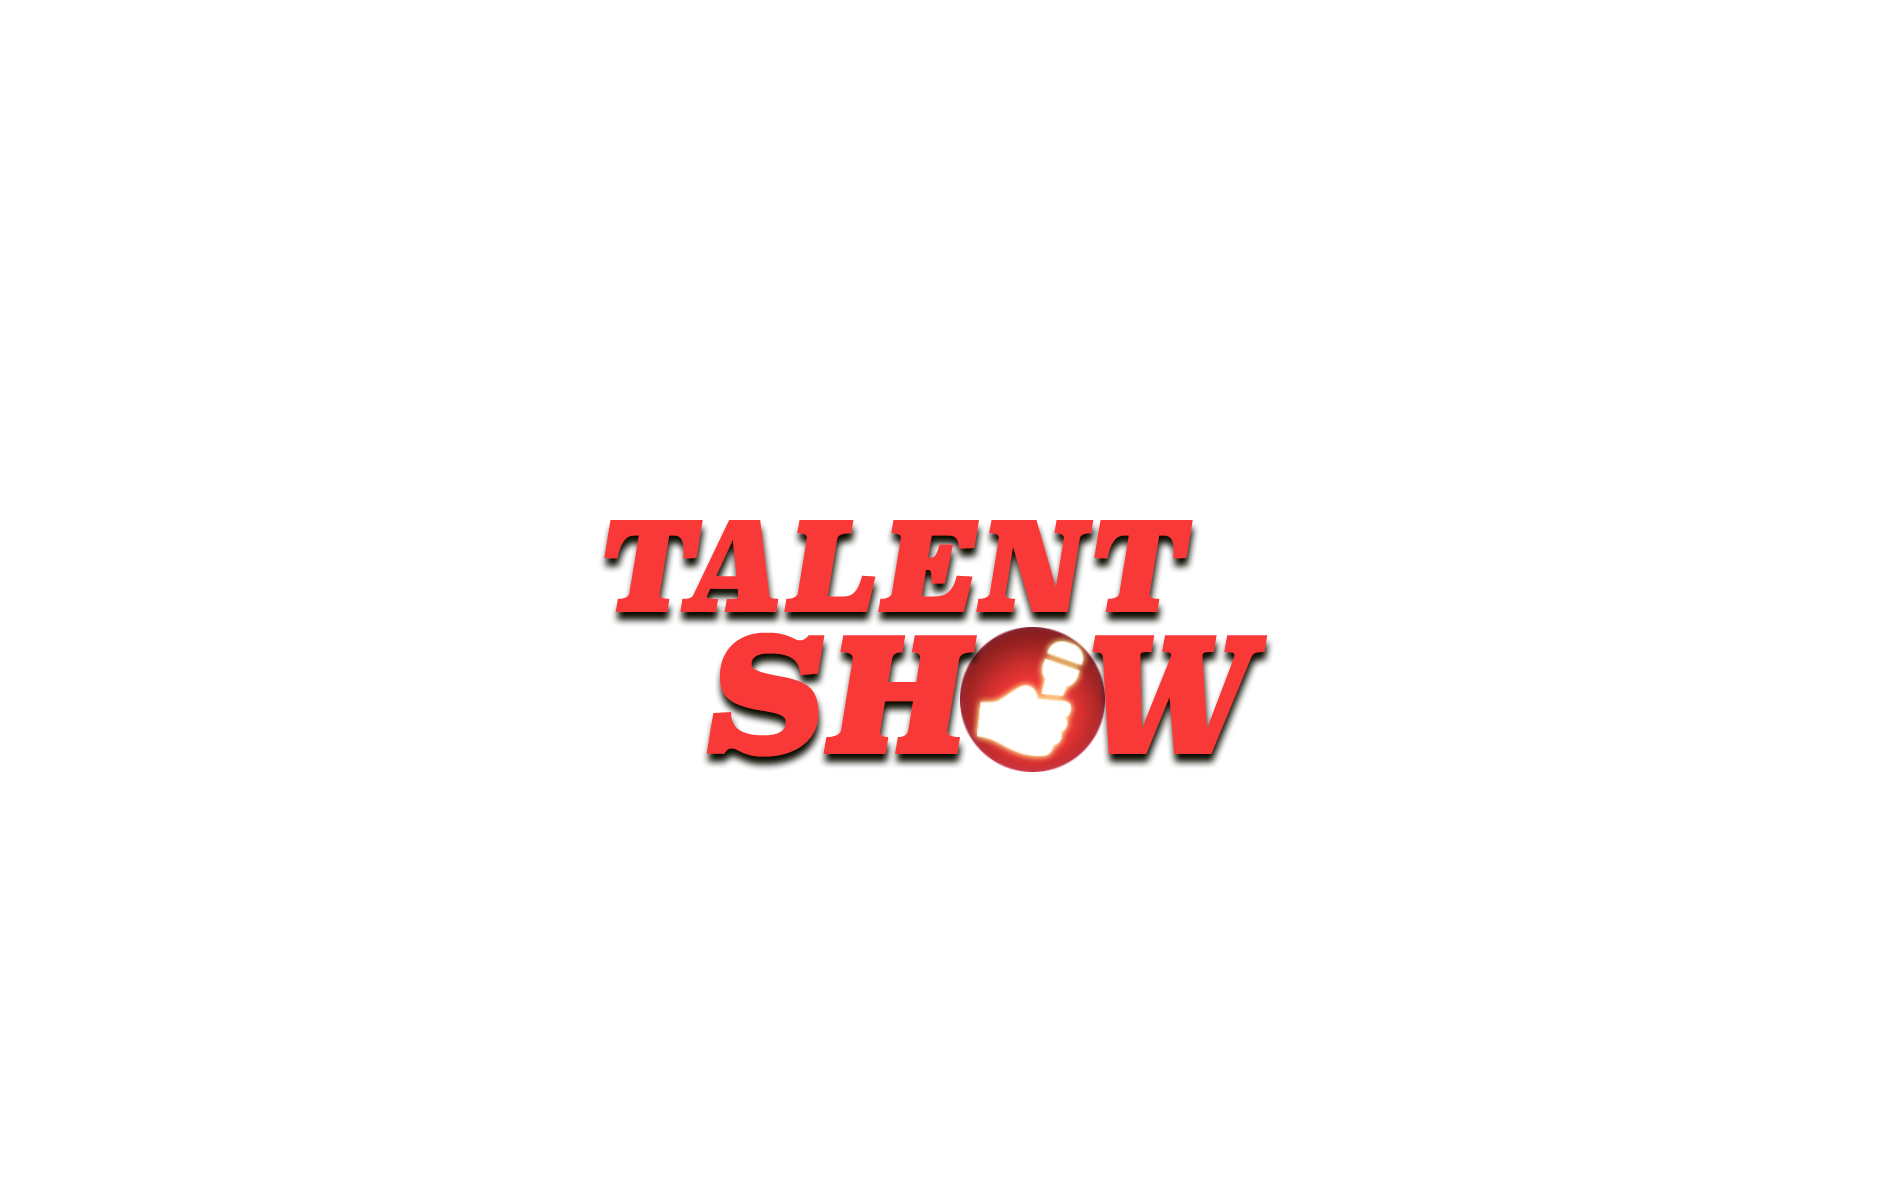 Logo talent show